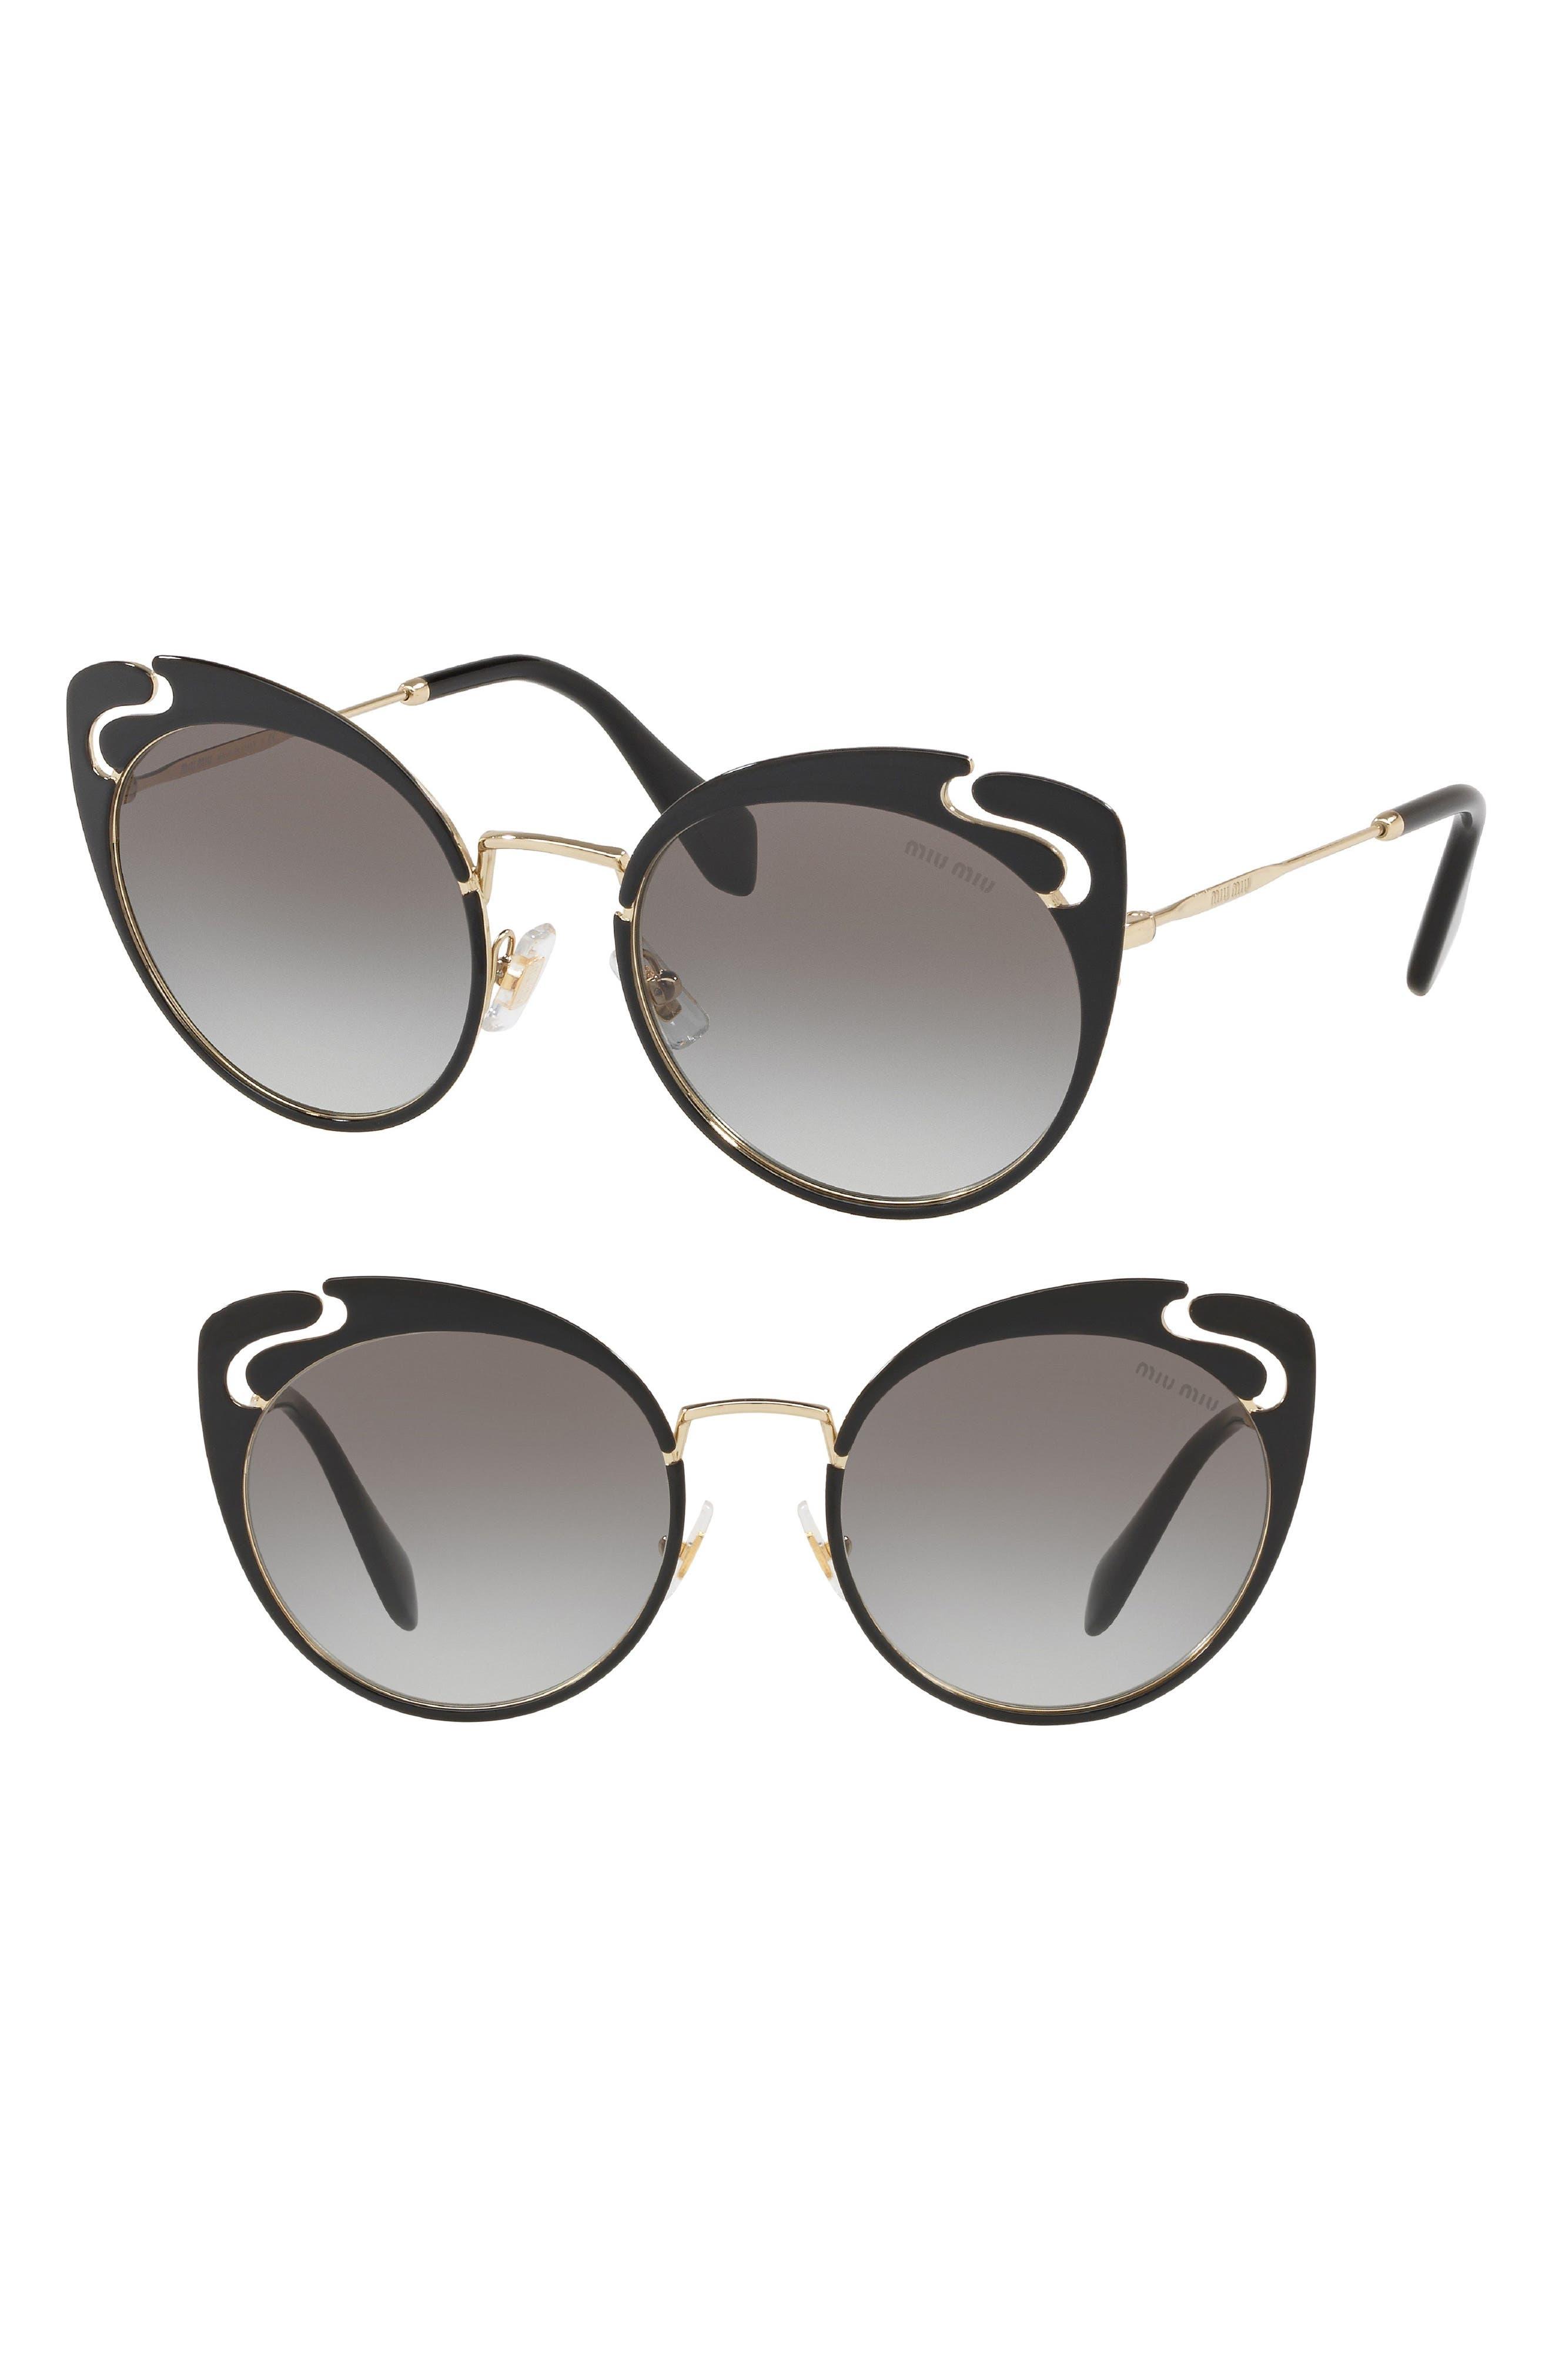 Miu Miu Noir Evolution 5m Cat Eye Sunglasses - Gold/ Black Gradient